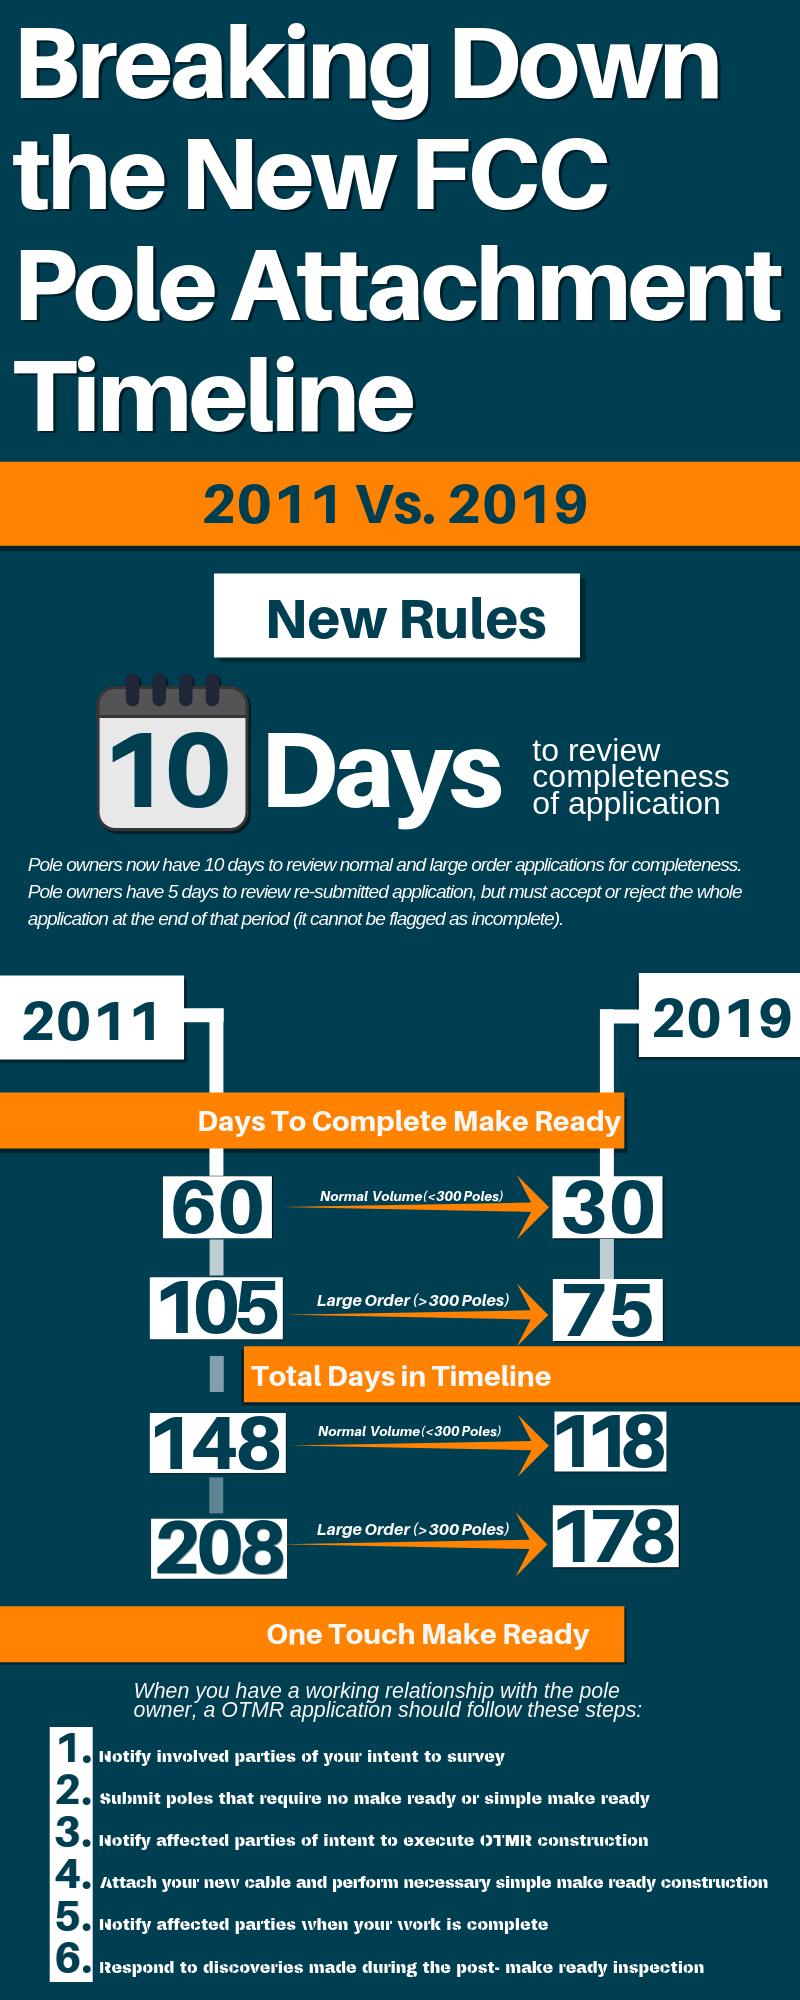 FCC Timeline Infographic 2011 vs. 2019